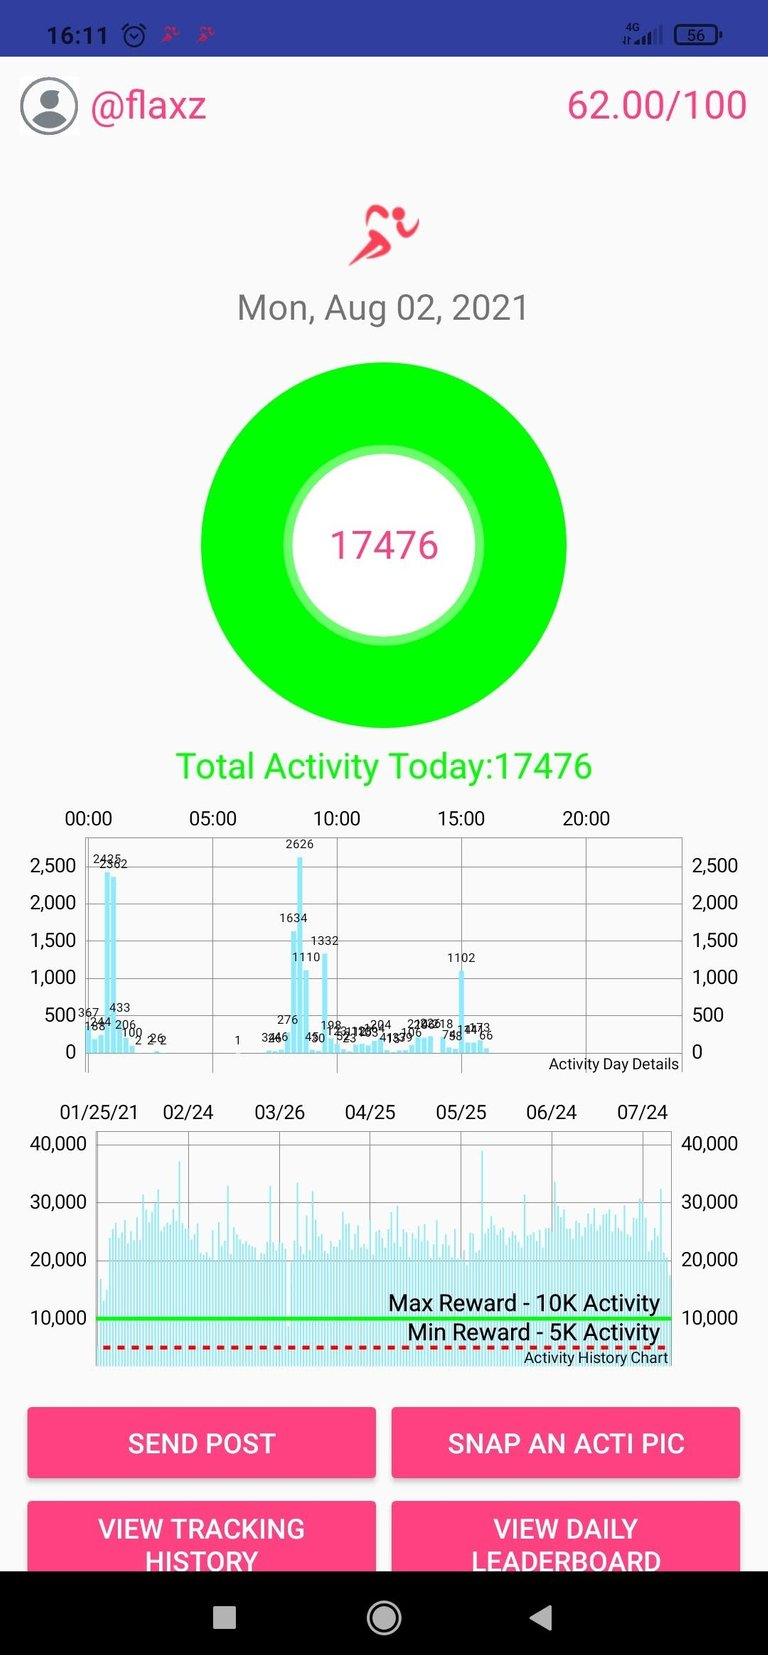 Screenshot_2021-08-02-16-11-20-134_io.actifit.fitnesstracker.actifitfitnesstracker.jpg